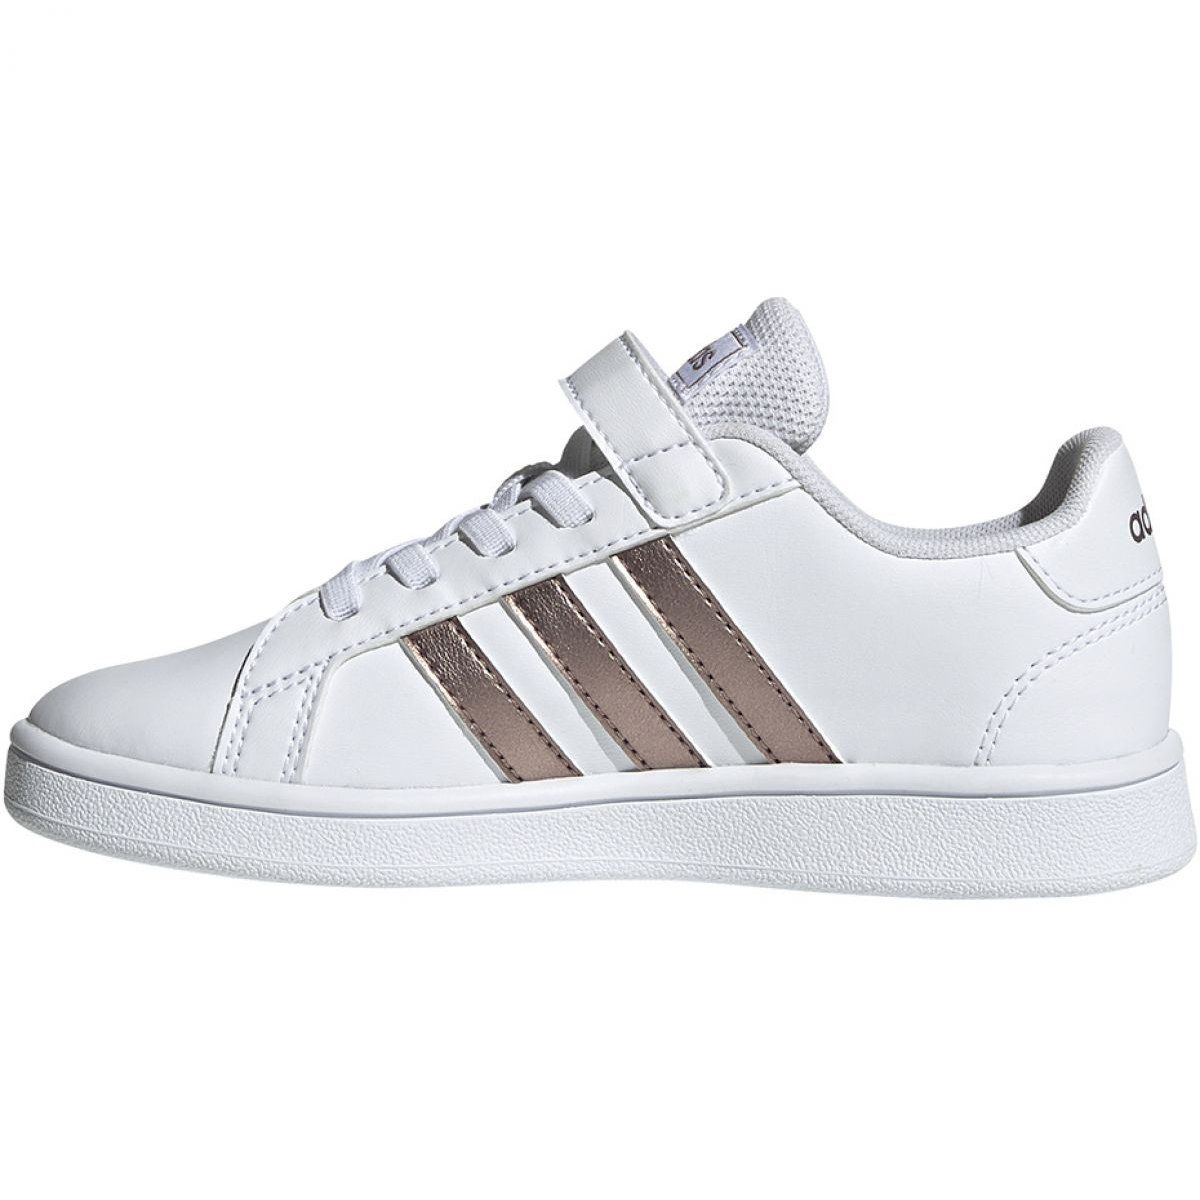 Adidas Grand Court C Jr Ef0107 Shoes White Adidas Sports Shoes Adidas Shoes